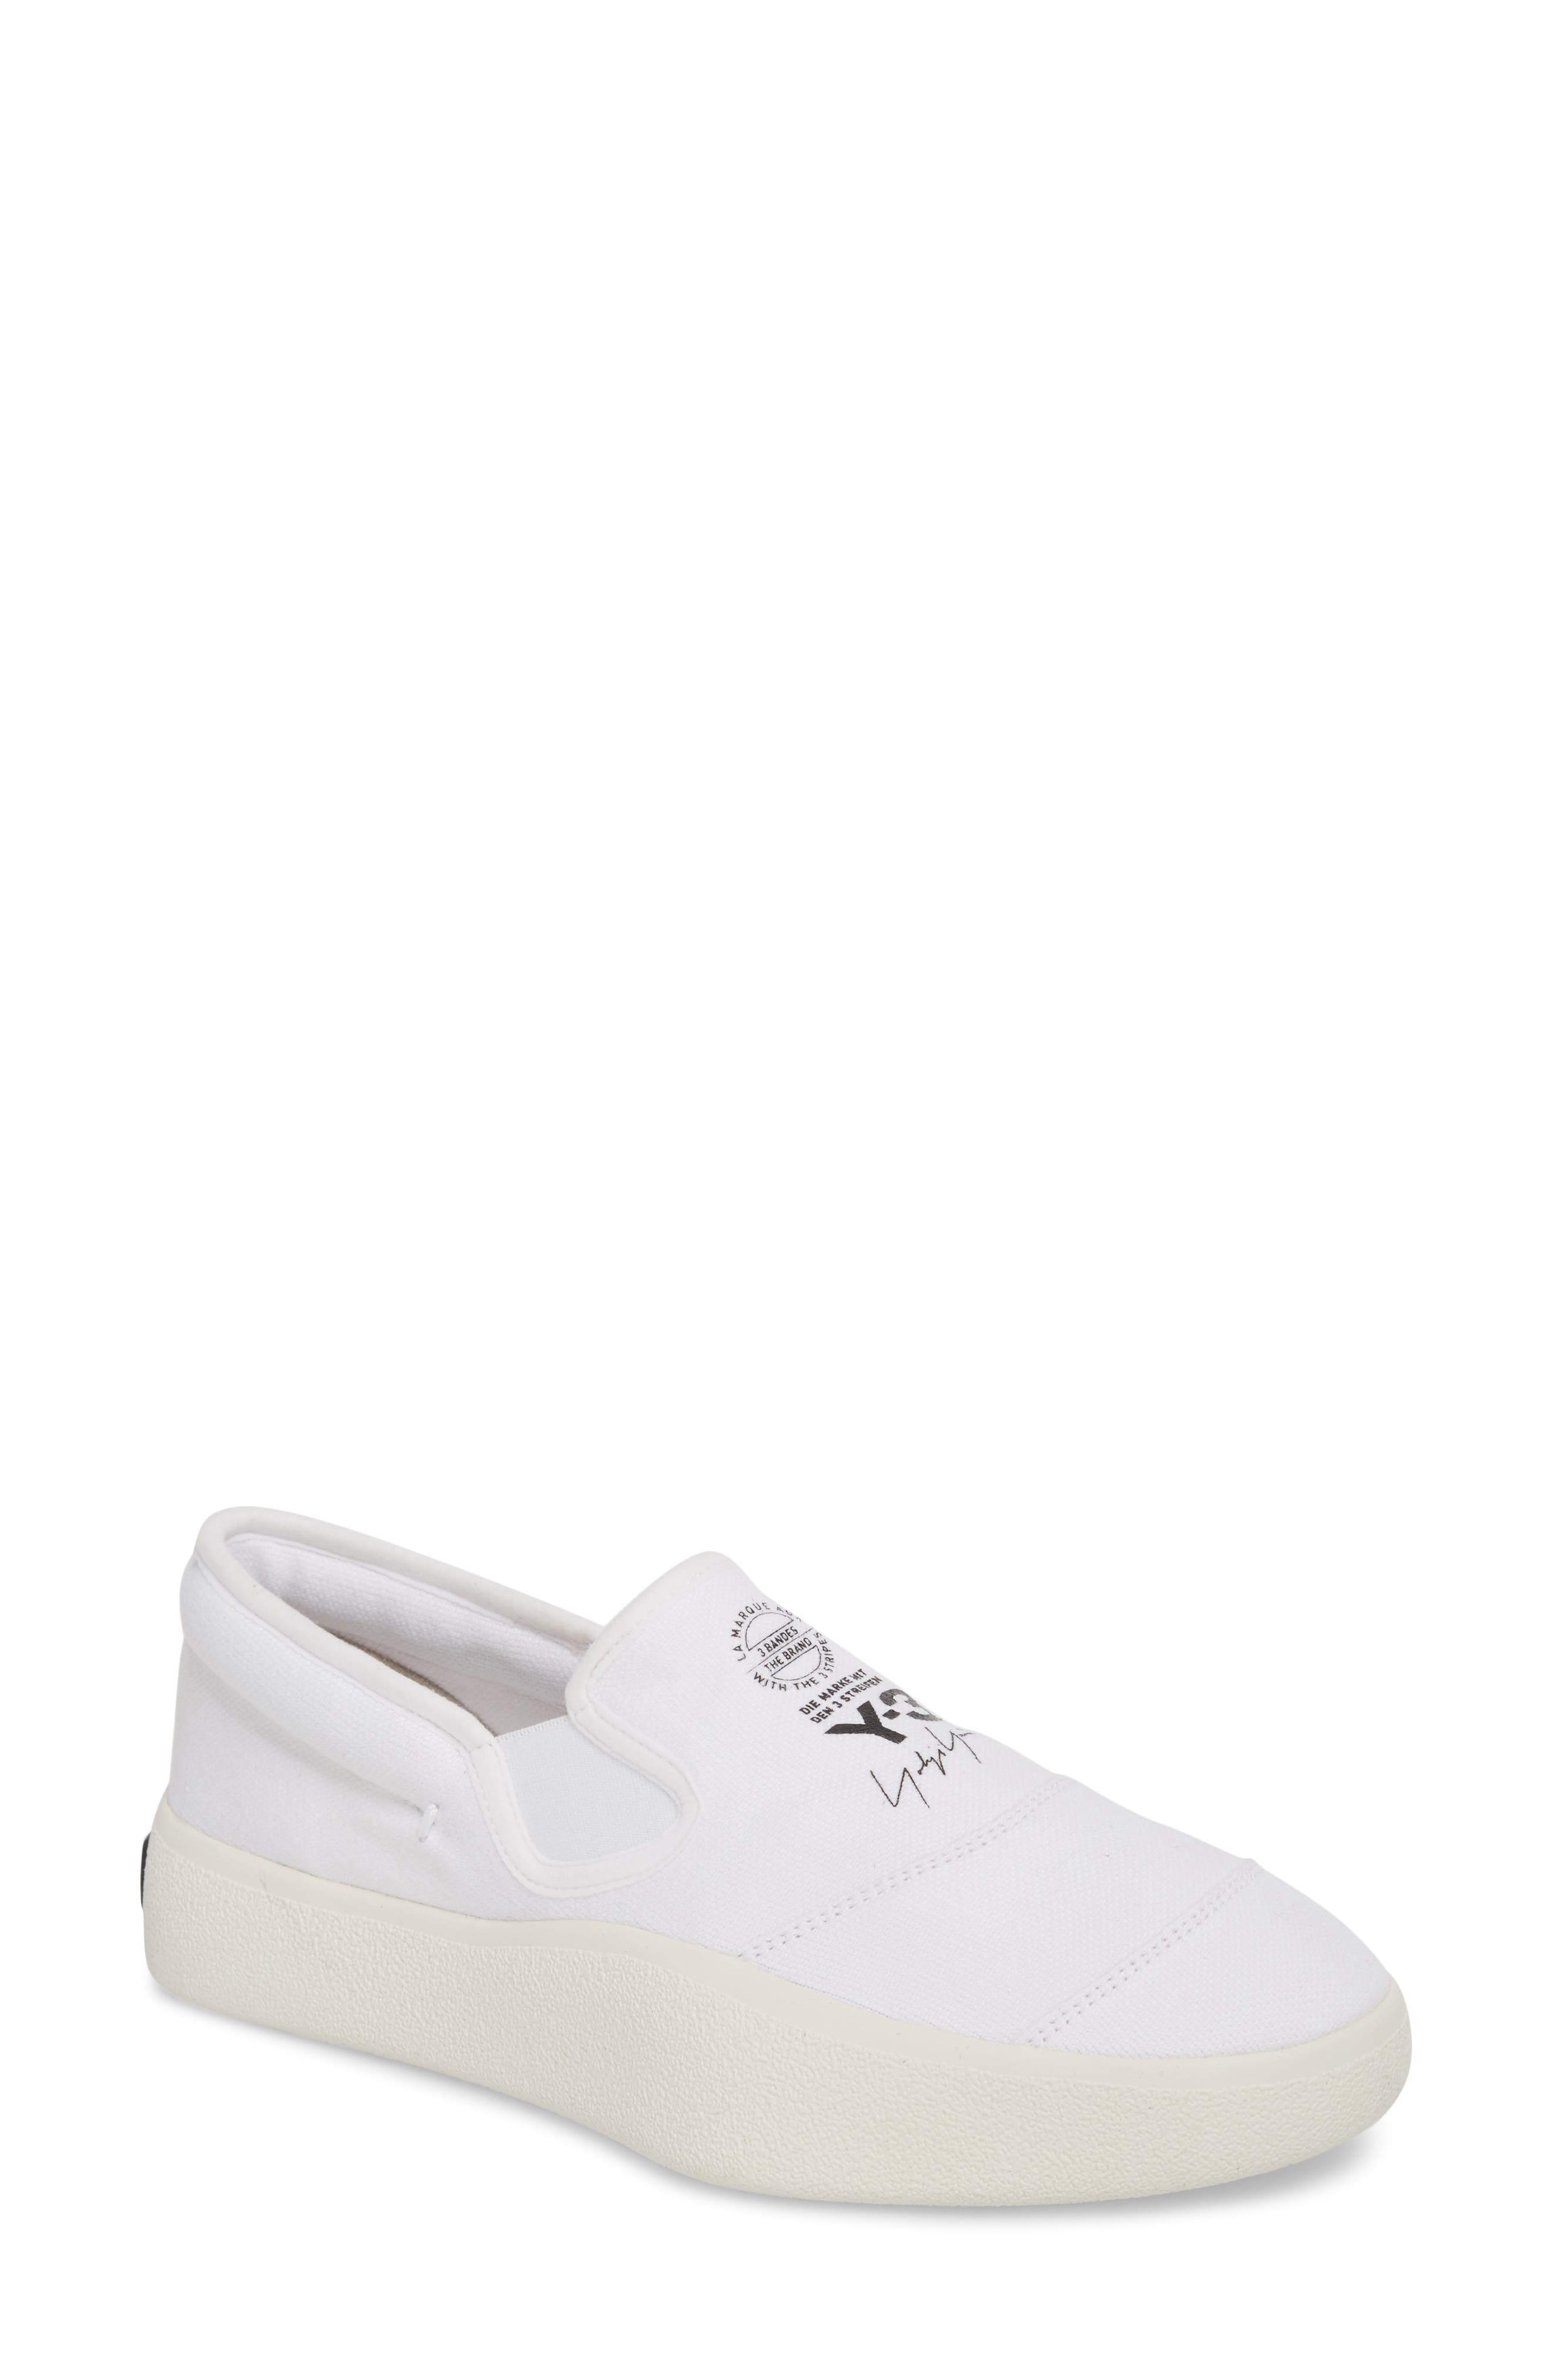 Main Image - Y-3 Tangutsu Slip-On Sneaker (Women)